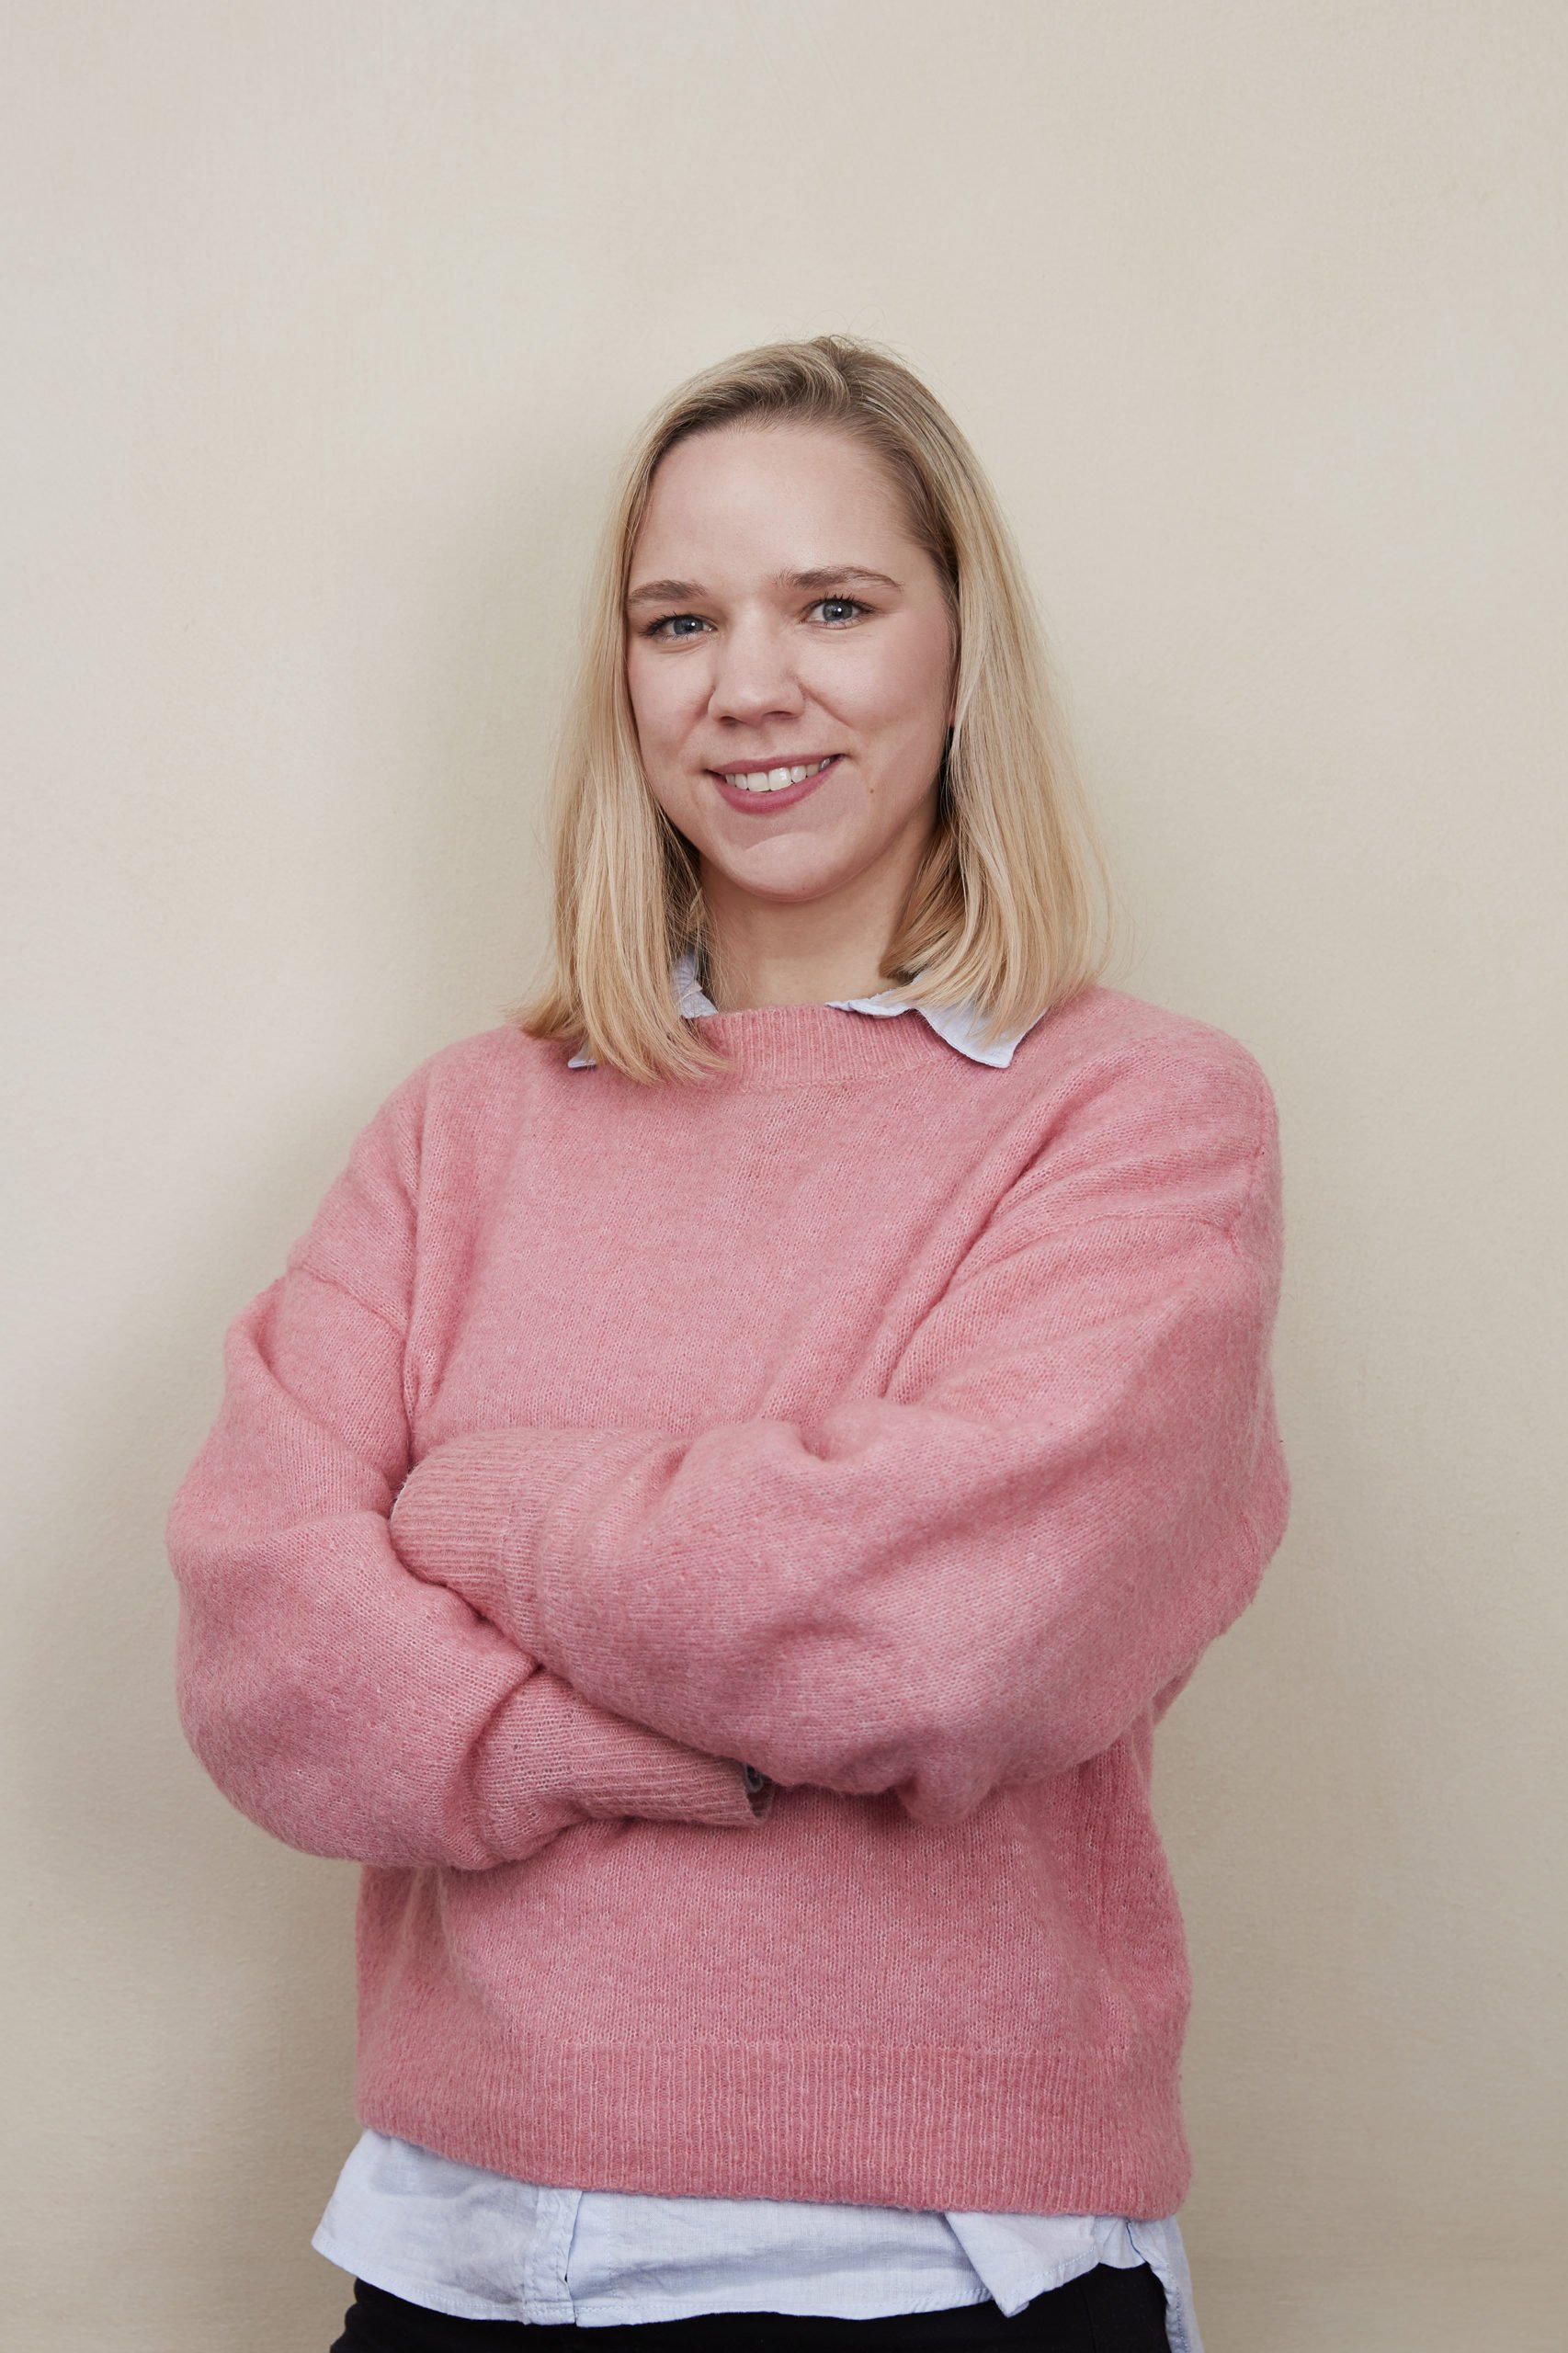 Linnea Skogfors climate strategist at ZeroMission